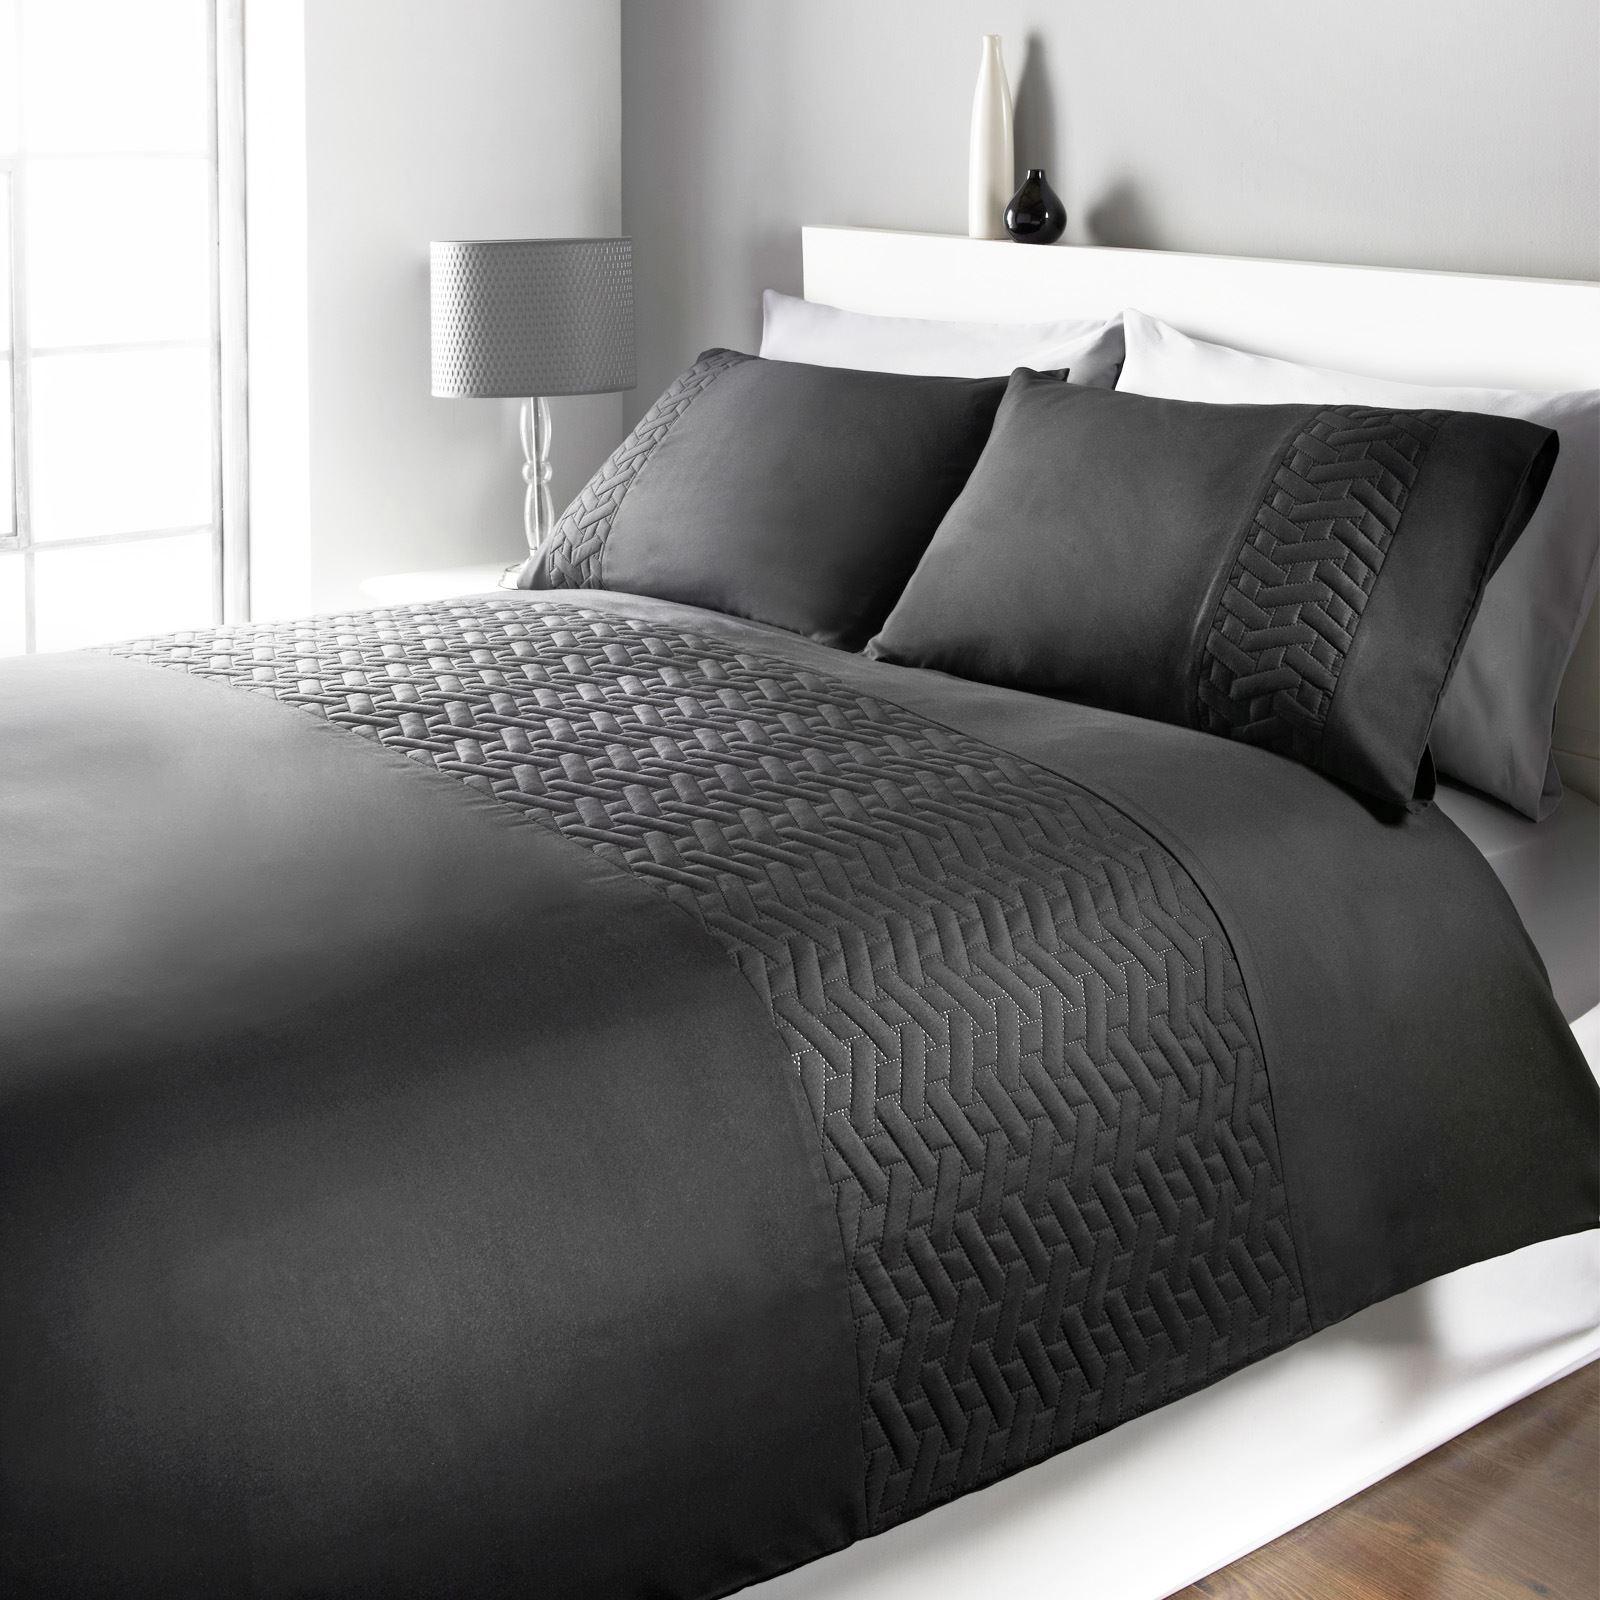 Brentfords-Pinsonic-Stripe-Duvet-Cover-with-Pillow-Case-Bedding-Set-Blush-Silver thumbnail 8